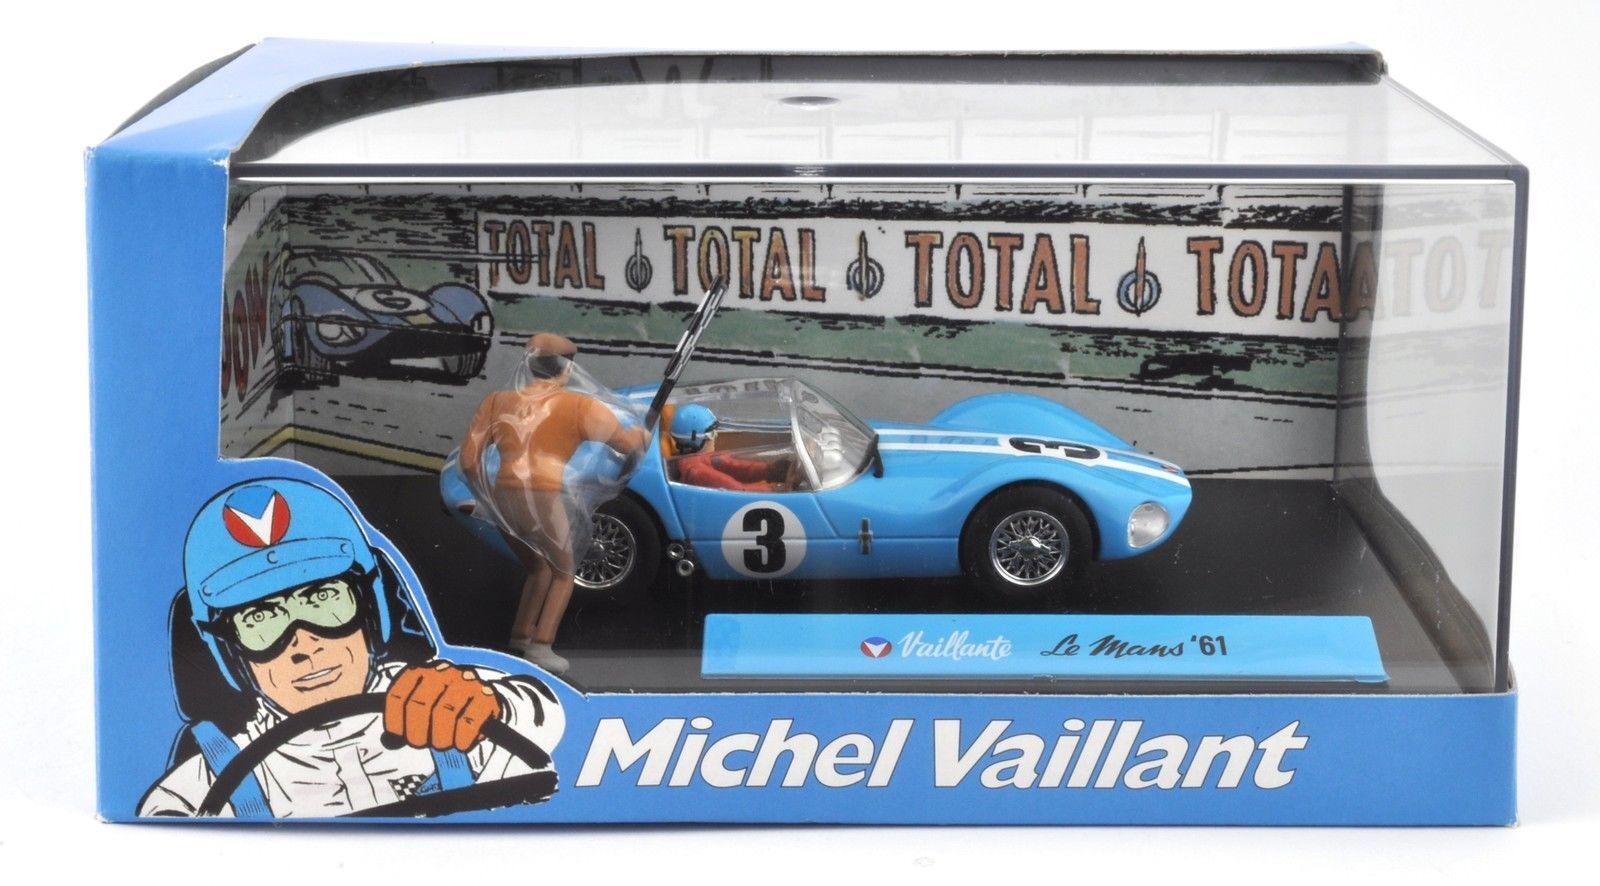 Michel Vaillant Le Mans '61 - 1 43 IXO ALTAYA VOITURE DIECAST MODEL V1